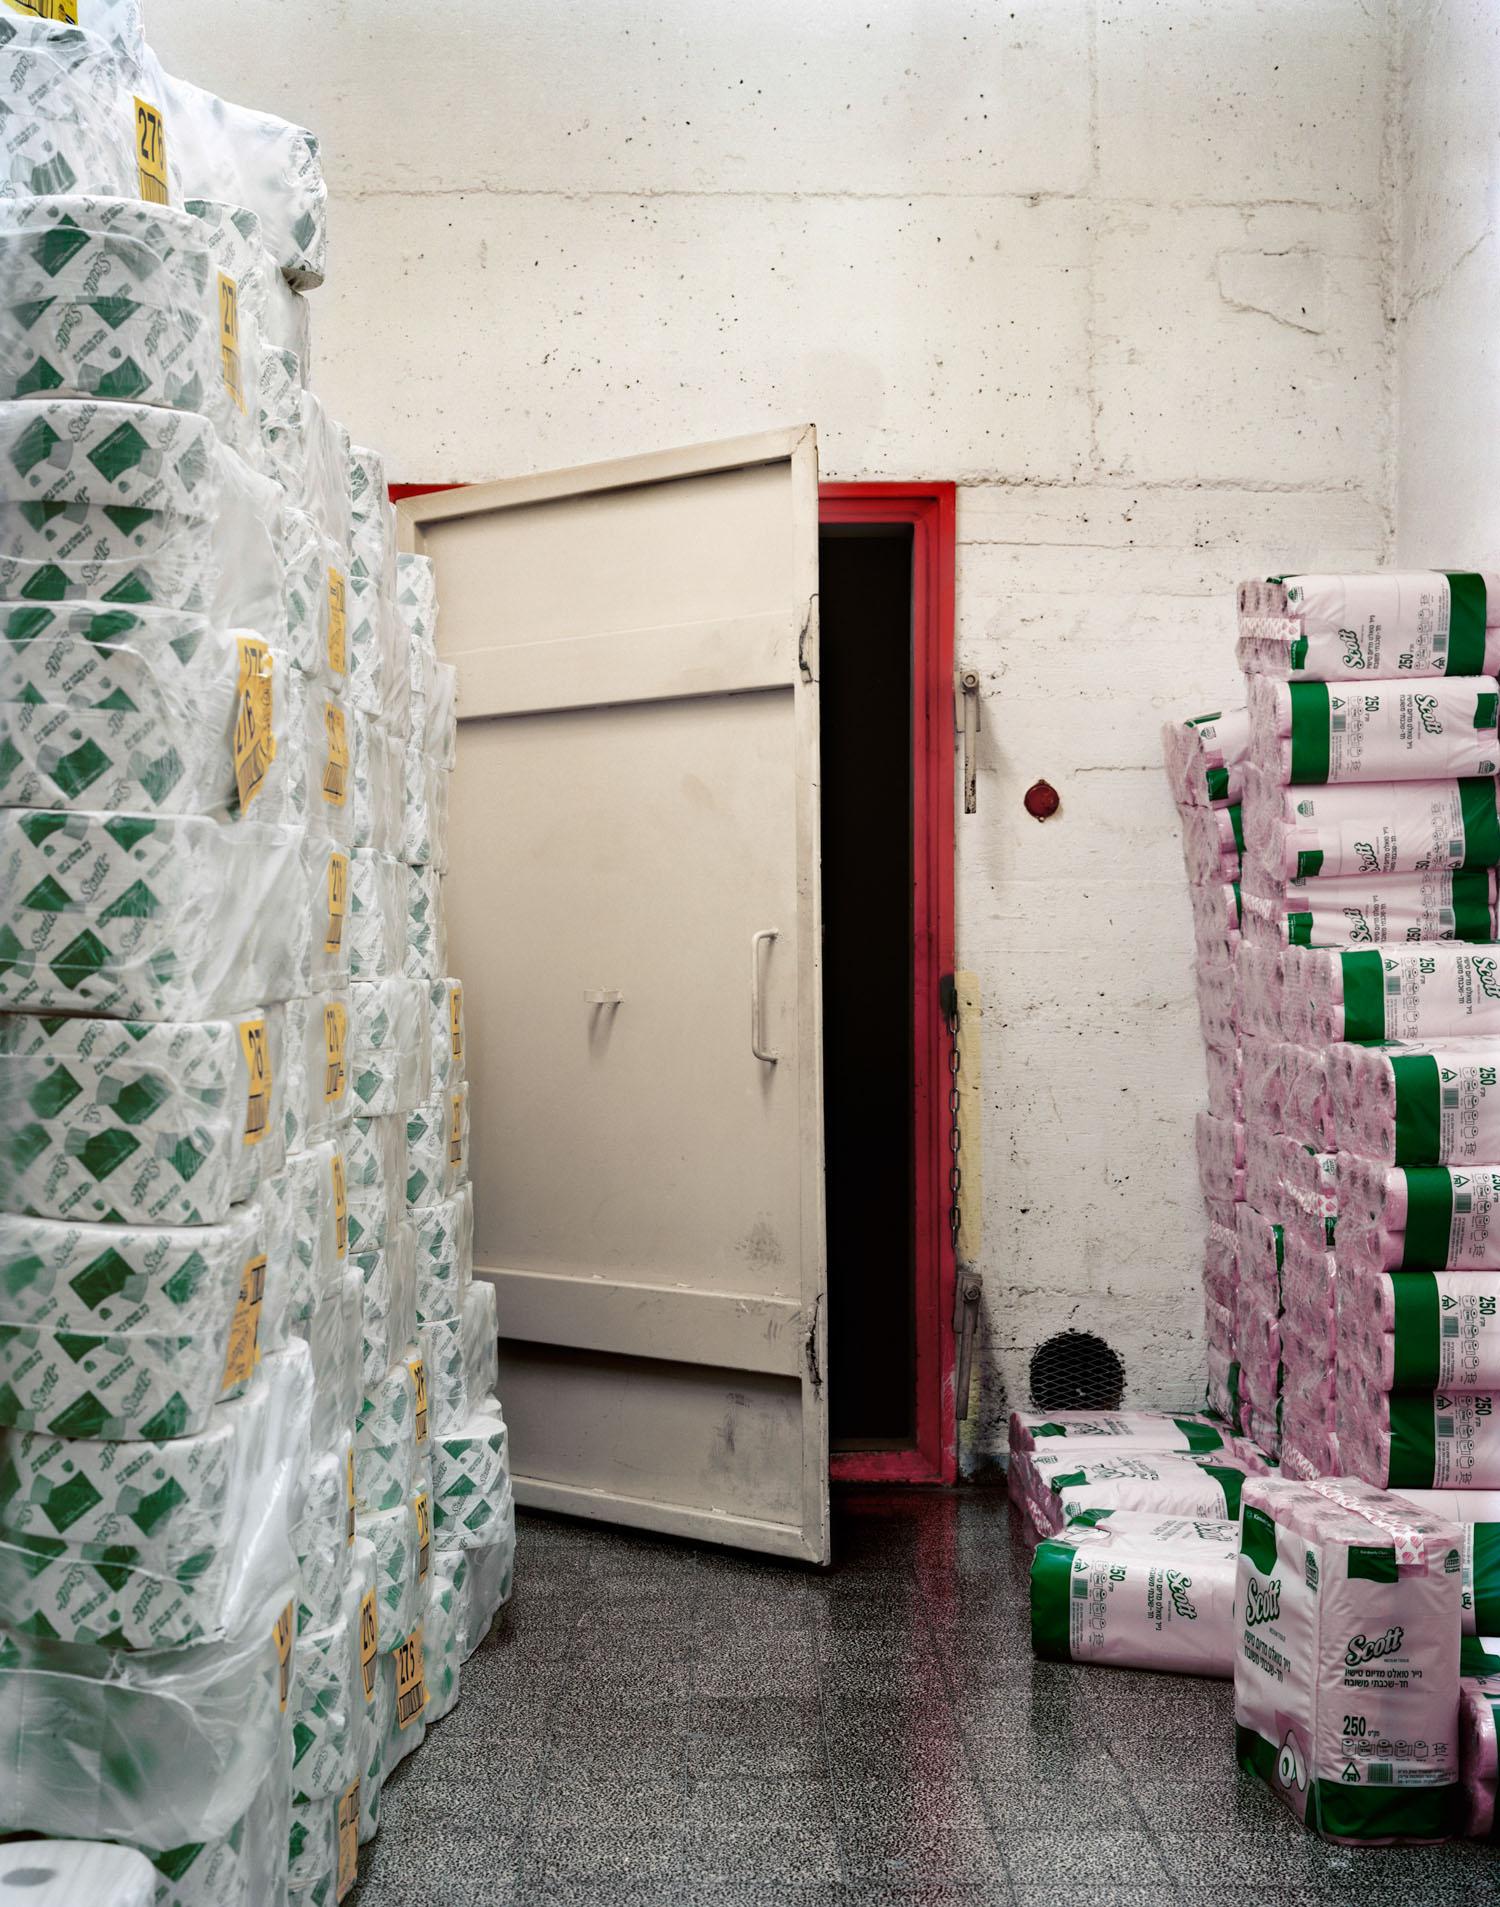 "Toilet Paper Stacks, Hebrew University, Mount Scopus, Jerusalem, 2007, Chromogenic print, 30"" x 20"""